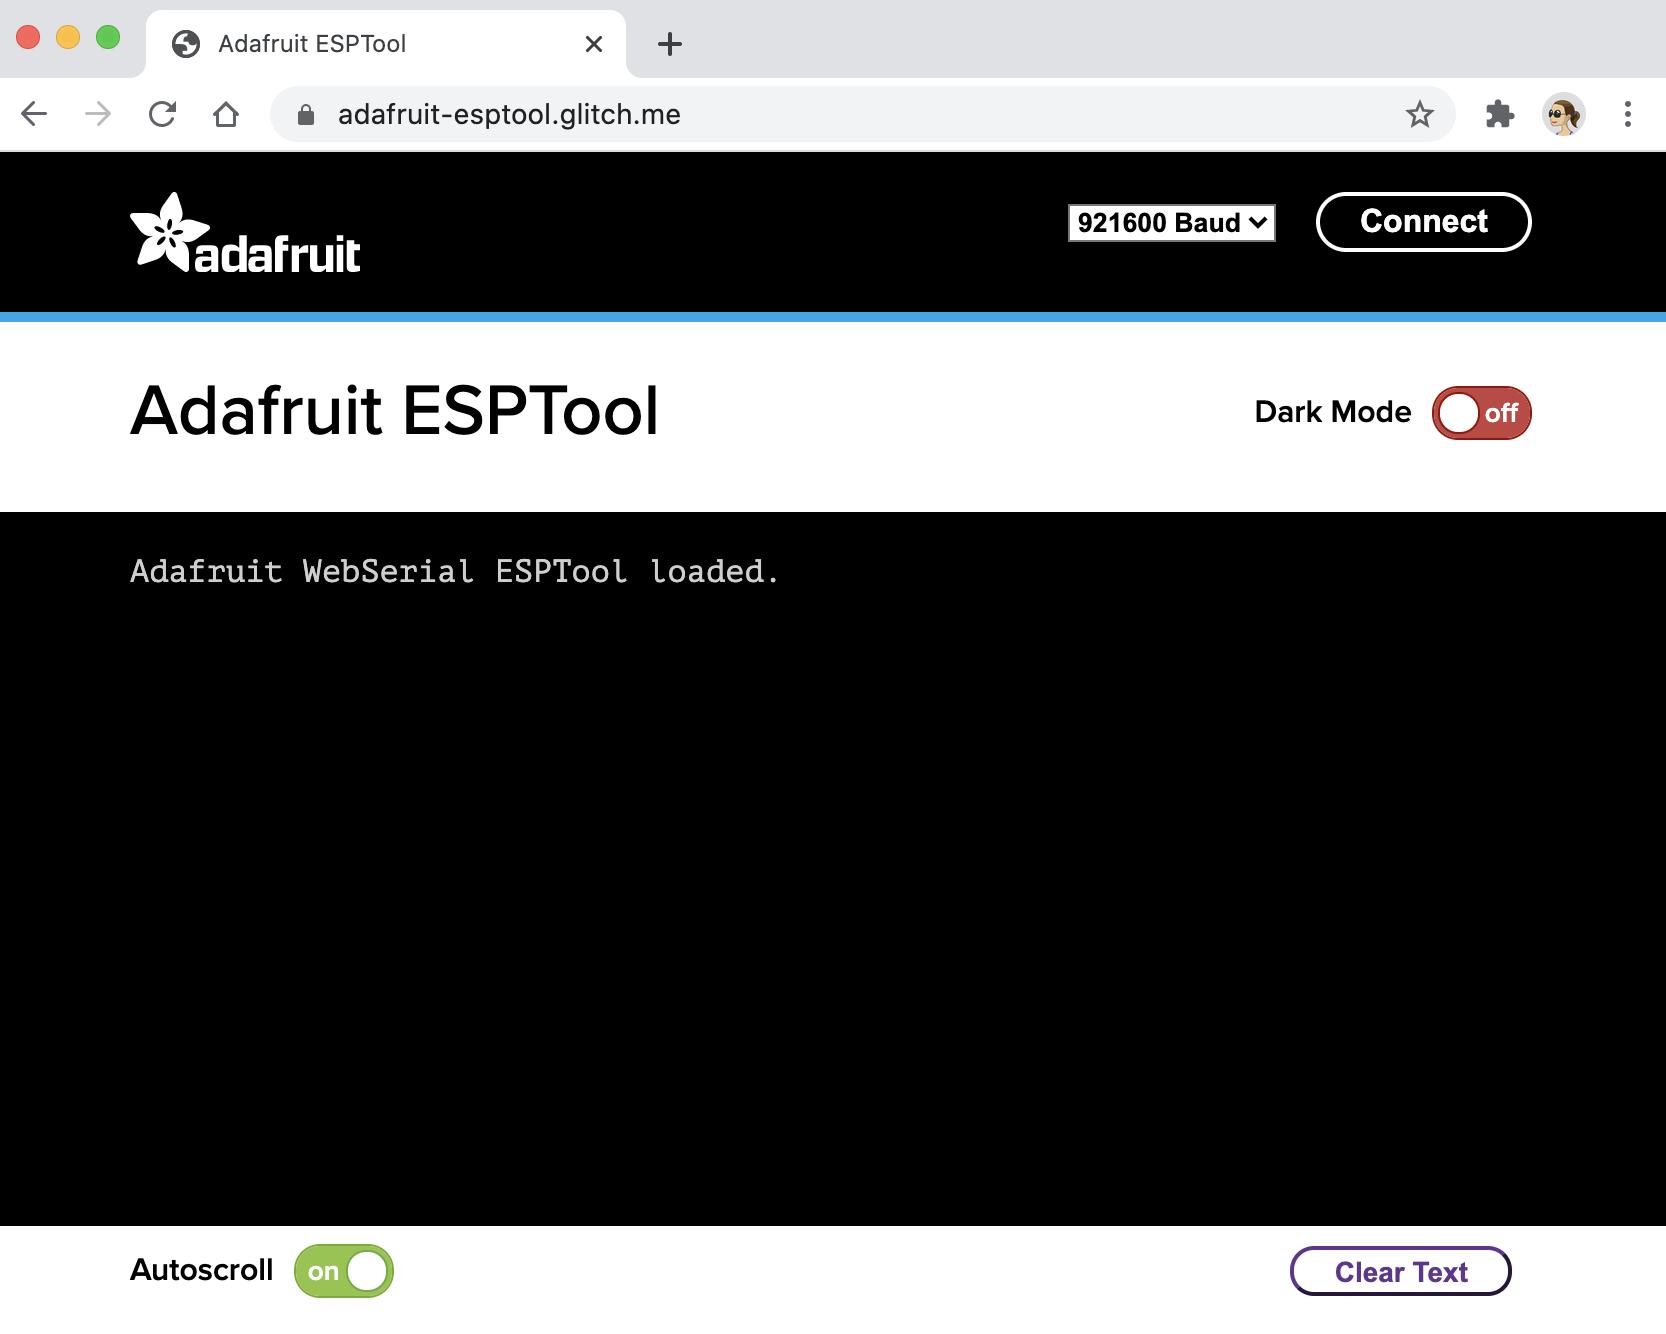 adafruit_products_Screen_Shot_2020-12-10_at_5.20.23_PM.png